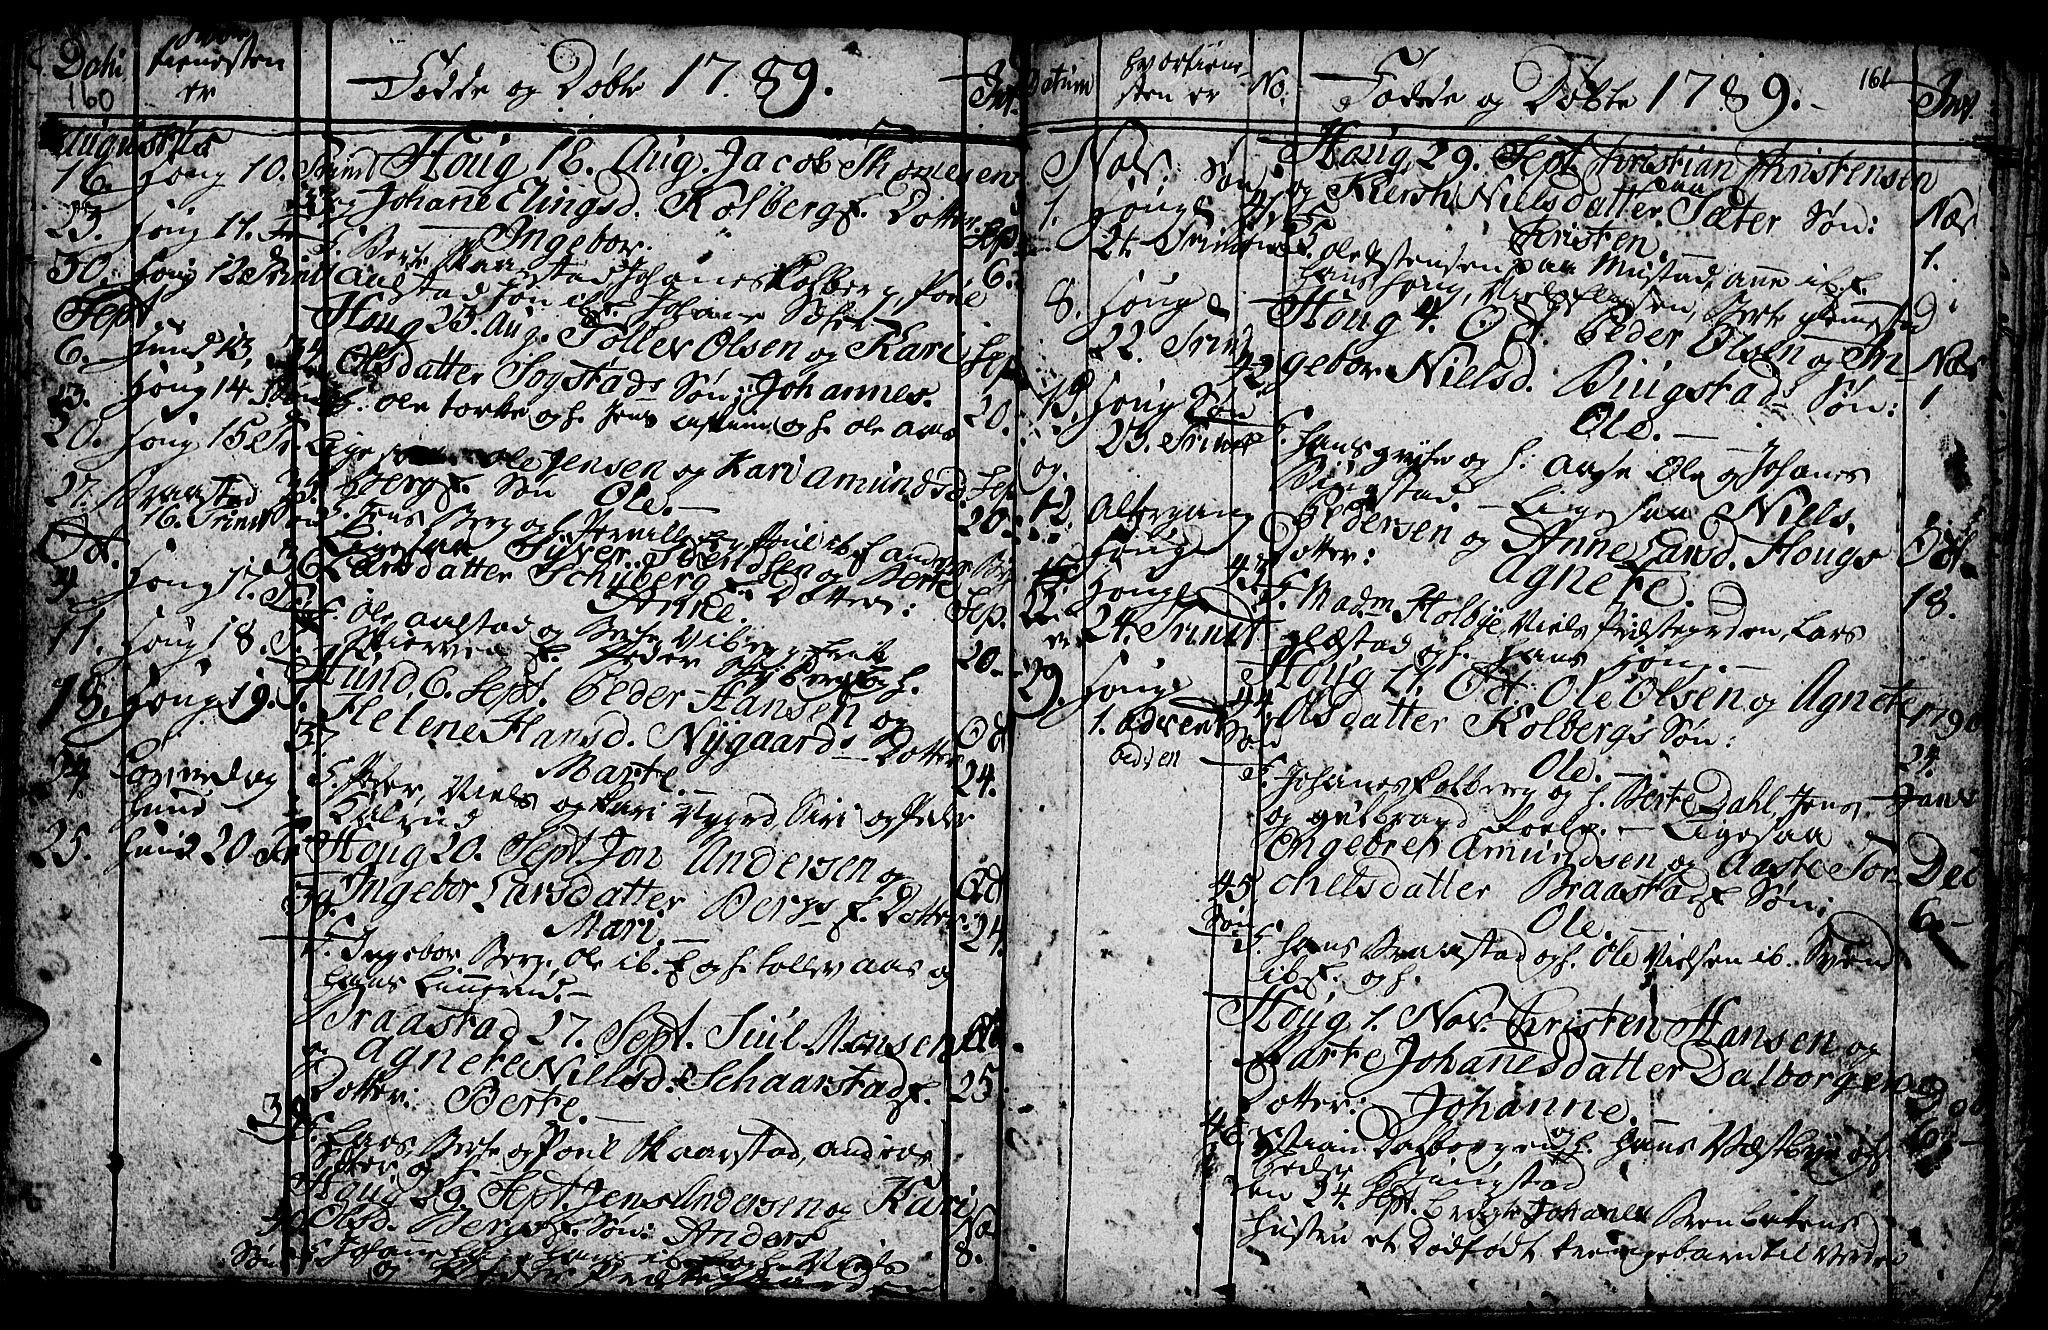 SAH, Vardal prestekontor, H/Ha/Hab/L0001: Klokkerbok nr. 1, 1771-1790, s. 160-161